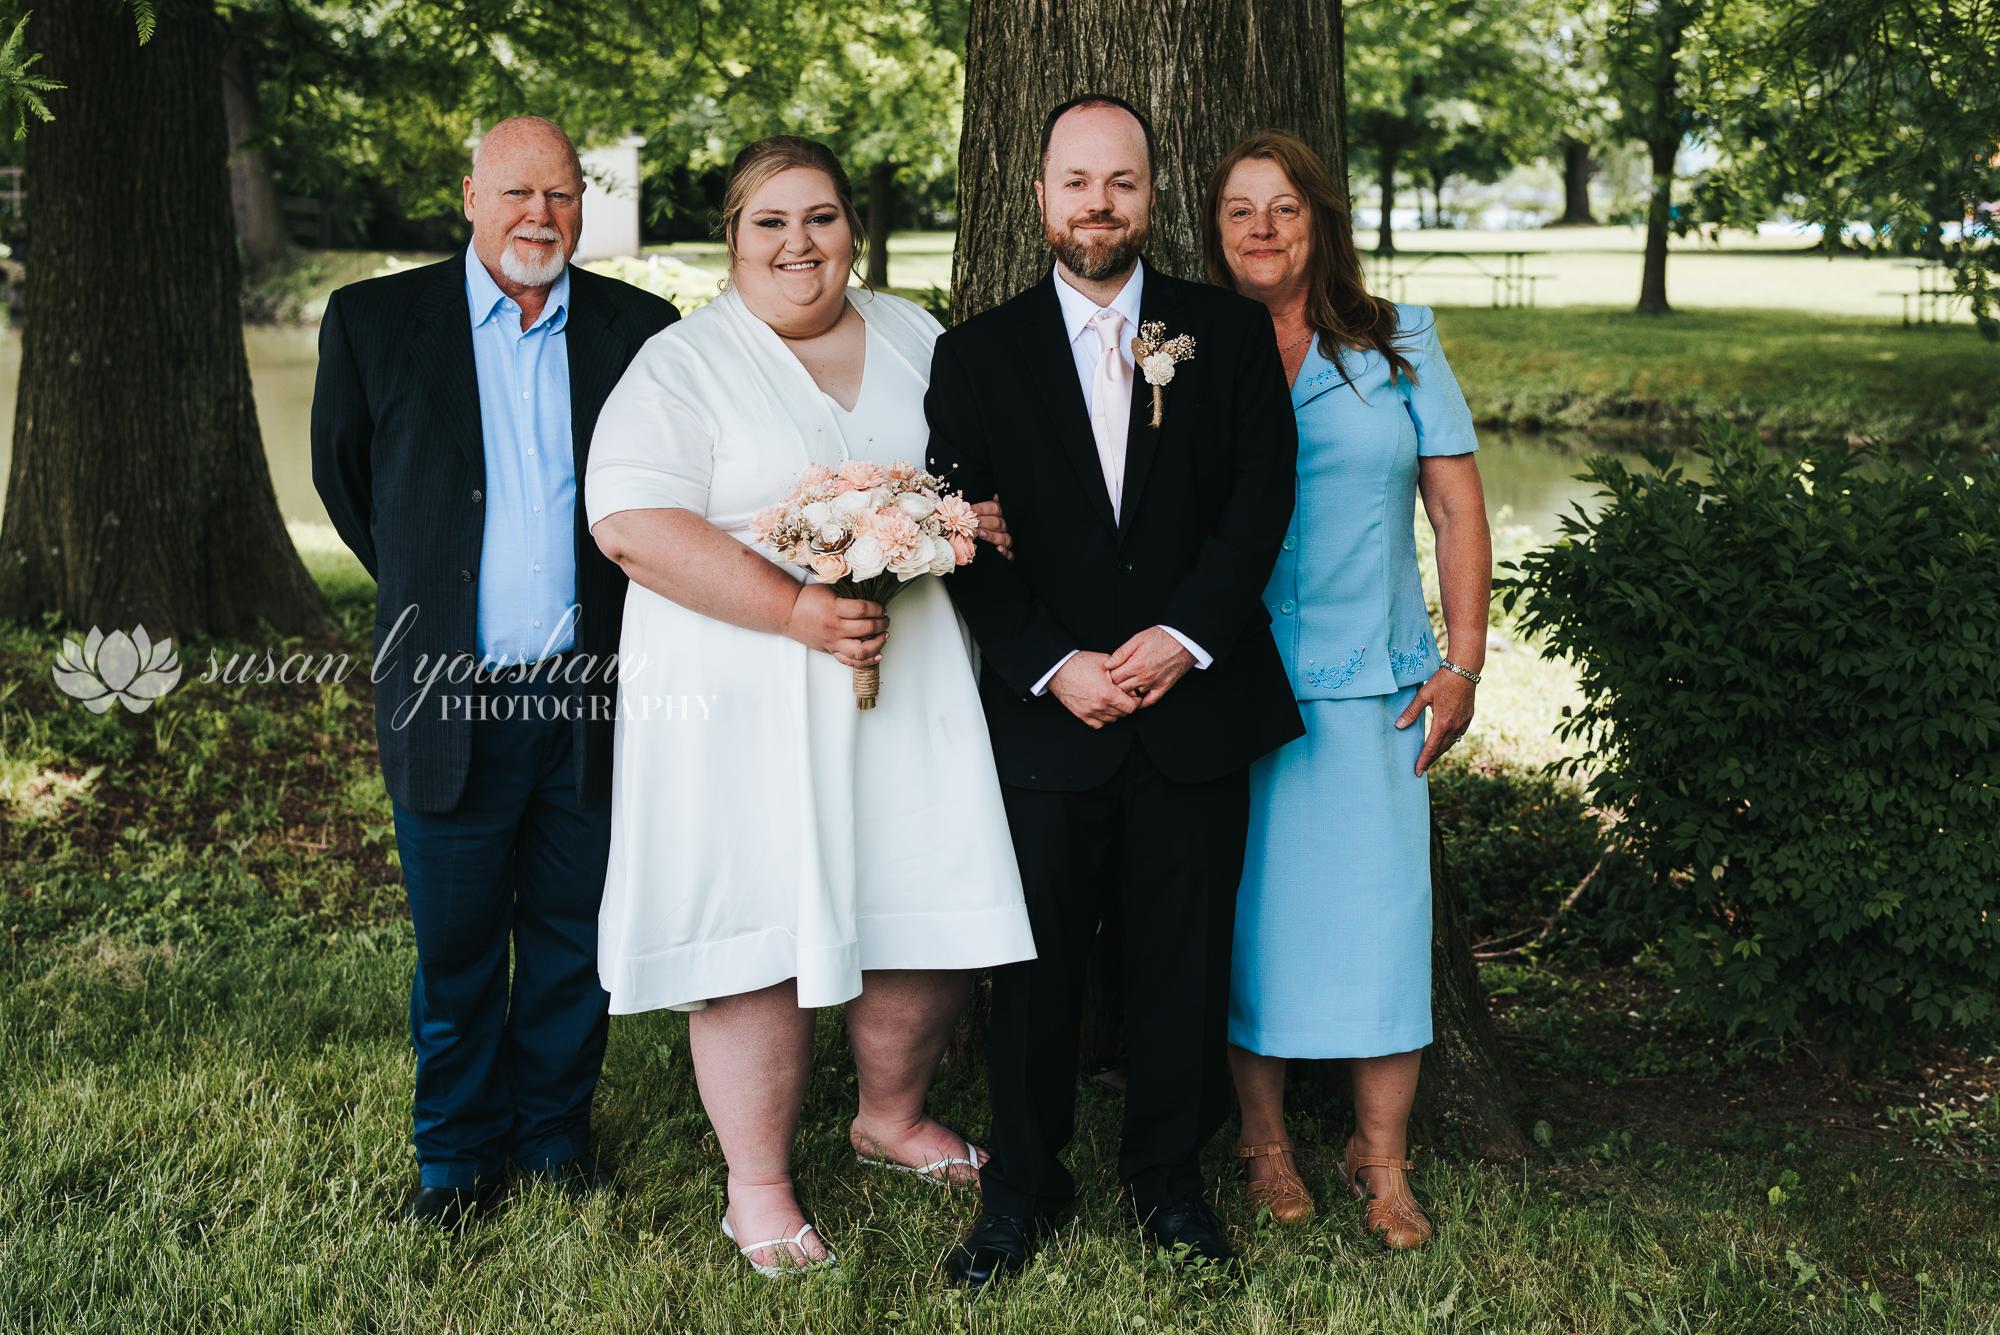 Bill and Sarah Wedding Photos 06-08-2019 SLY Photography -43.jpg